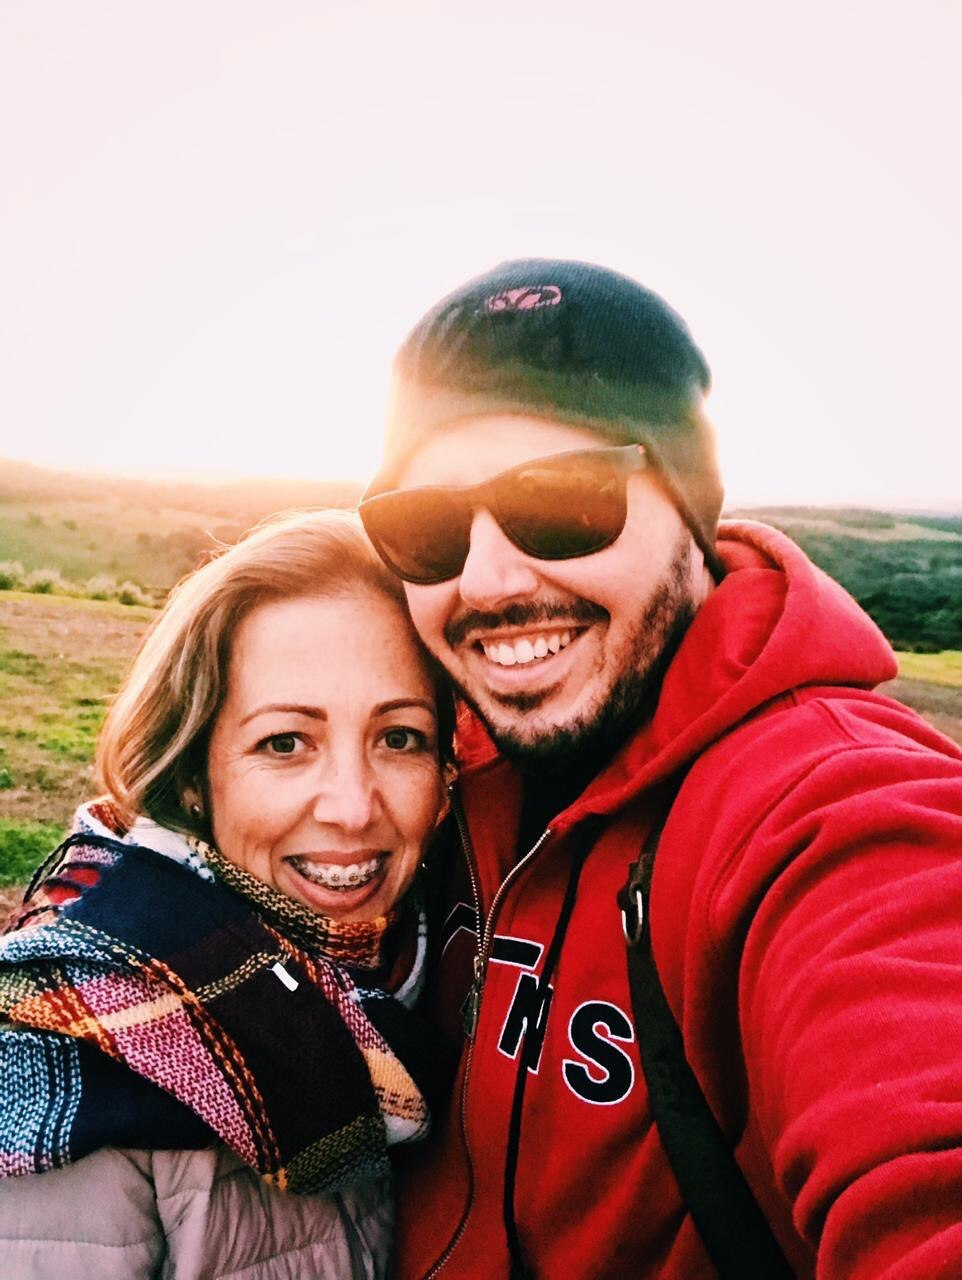 Sobre Fotografo de casamento Florianópolis - Rodrigo Santos - Fotografia de Casamento em Florianópolis